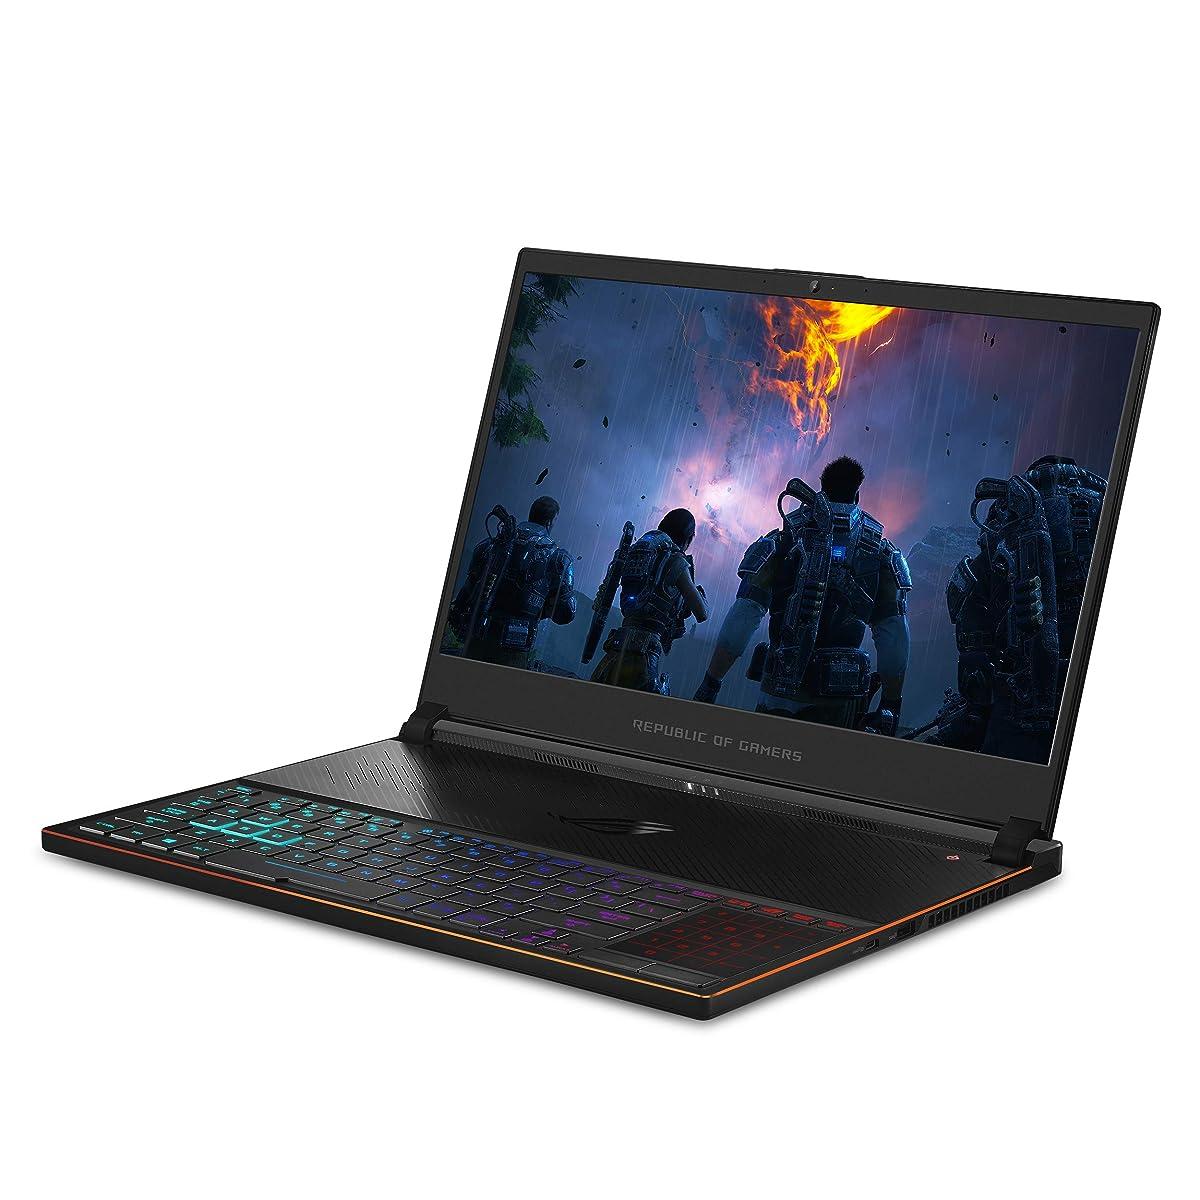 "ROG Zephyrus S Ultra Slim Gaming Laptop, 15.6"" 240Hz IPS-Type FHD, GeForce RTX 2080, Intel Core i7-9750H Processor, 16GB DDR4, 1TB PCIe Nvme SSD, Aura Sync RGB, Windows 10 Pro, GX531GX-XB76"